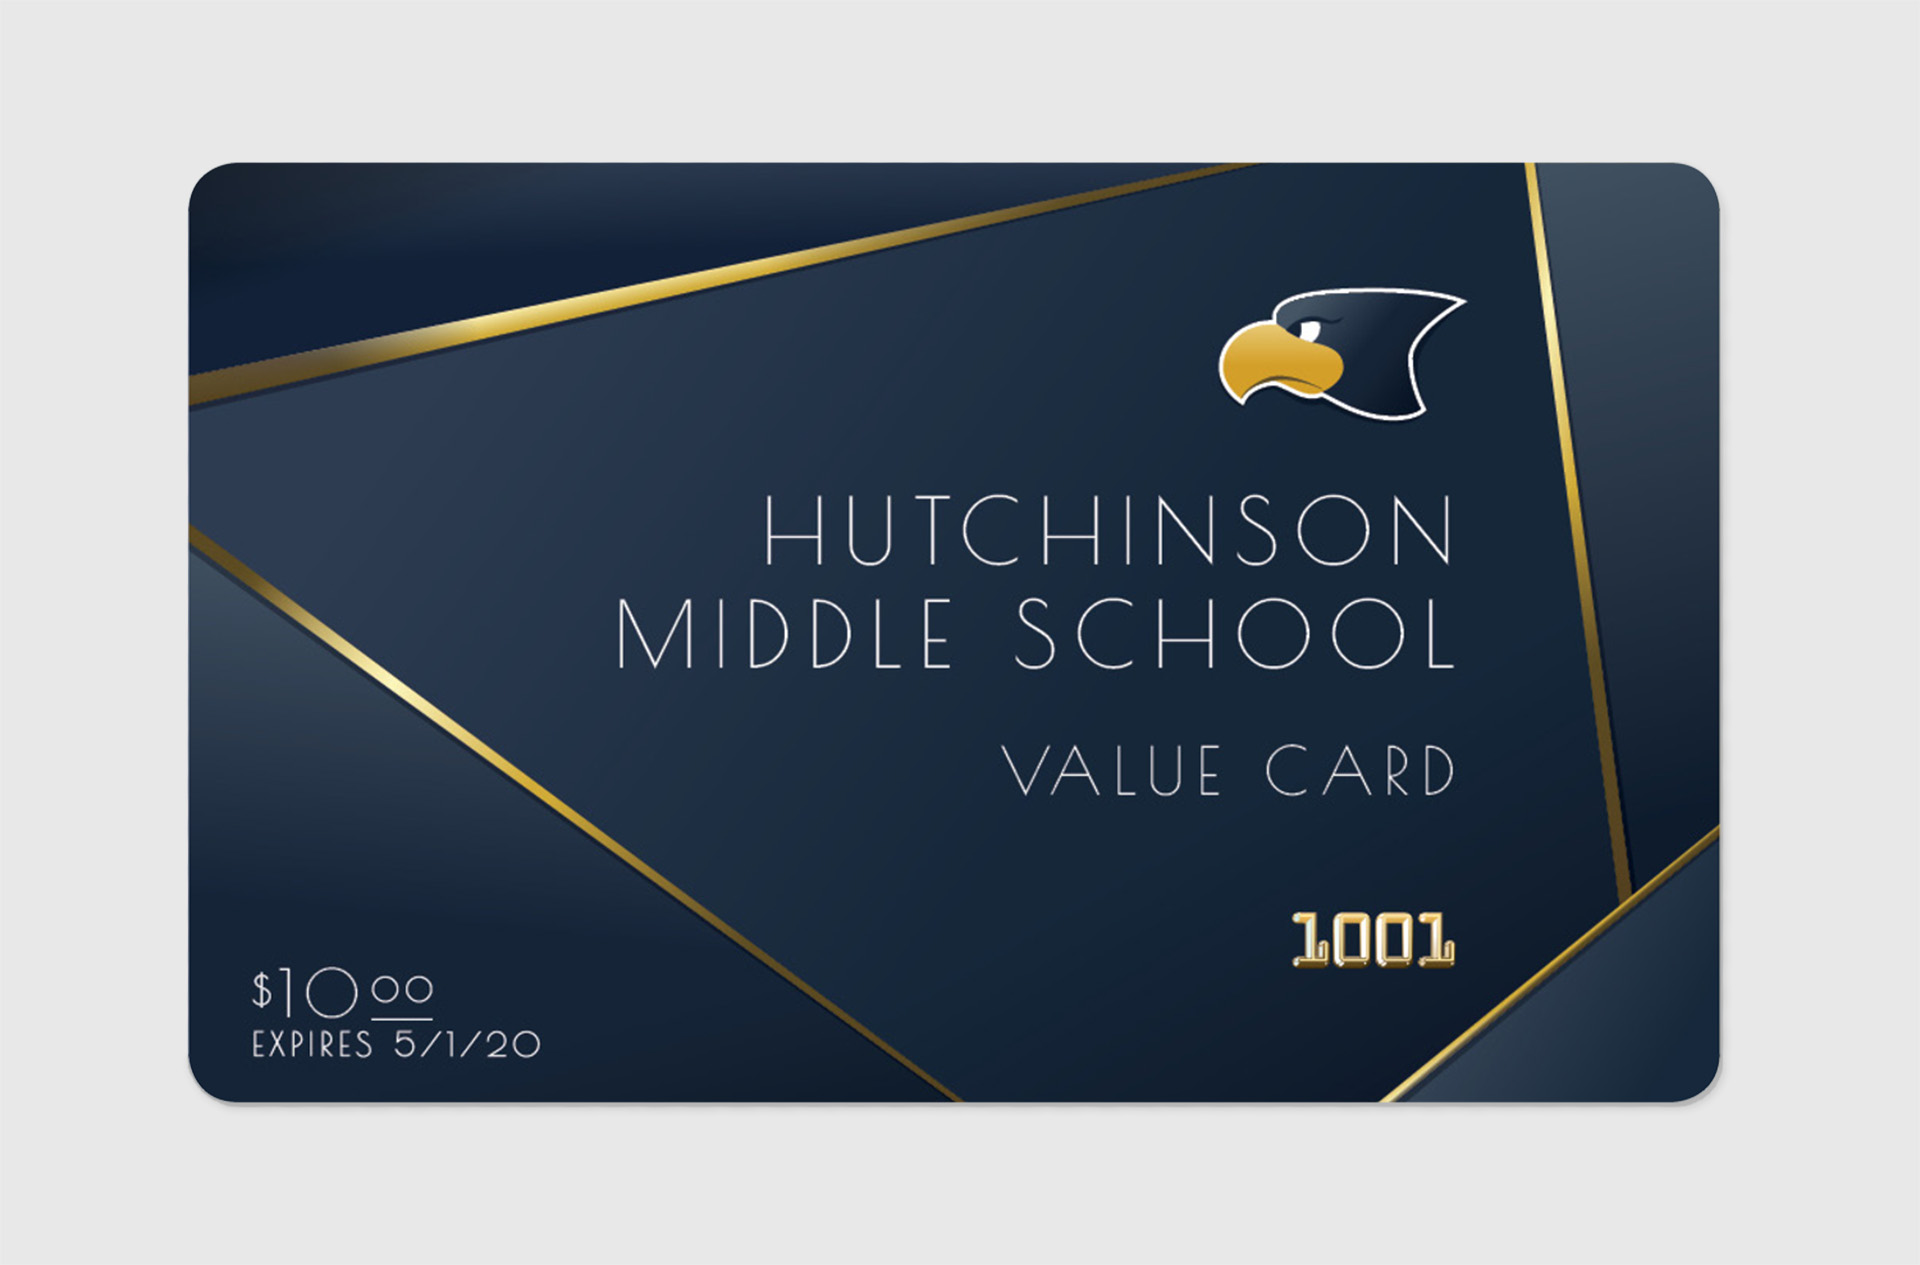 USD 308 Hutchinson Middle School Value Card Custom Print Graphic Design